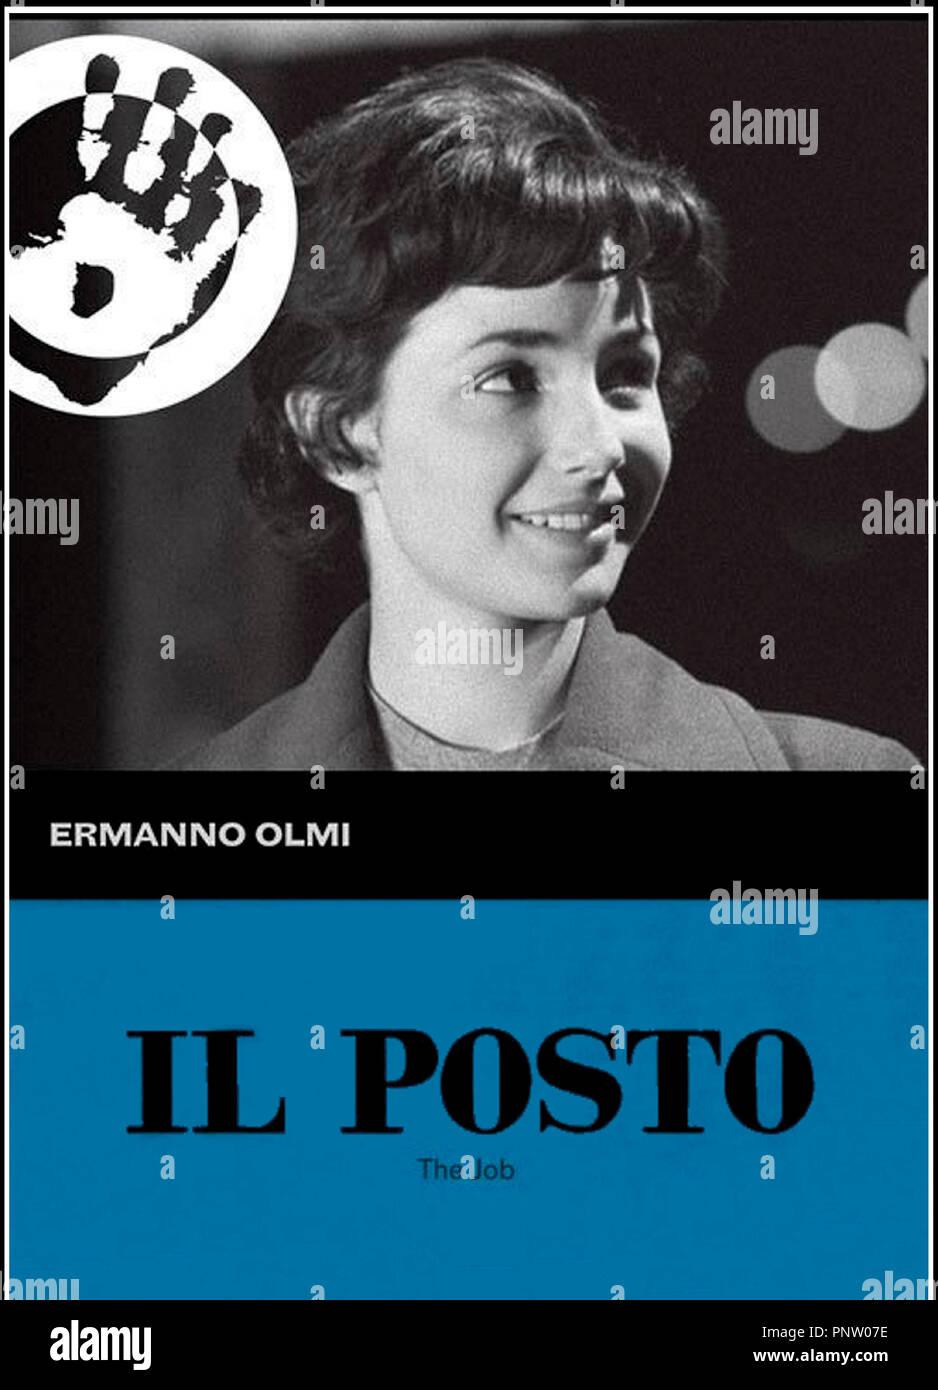 Prod DB © 24 Horses - Titanus   DR IL POSTO - L EMPLOI (IL POSTO) de Ermanno  Olmi 1961 ITA. visuel 582bc4ea72b